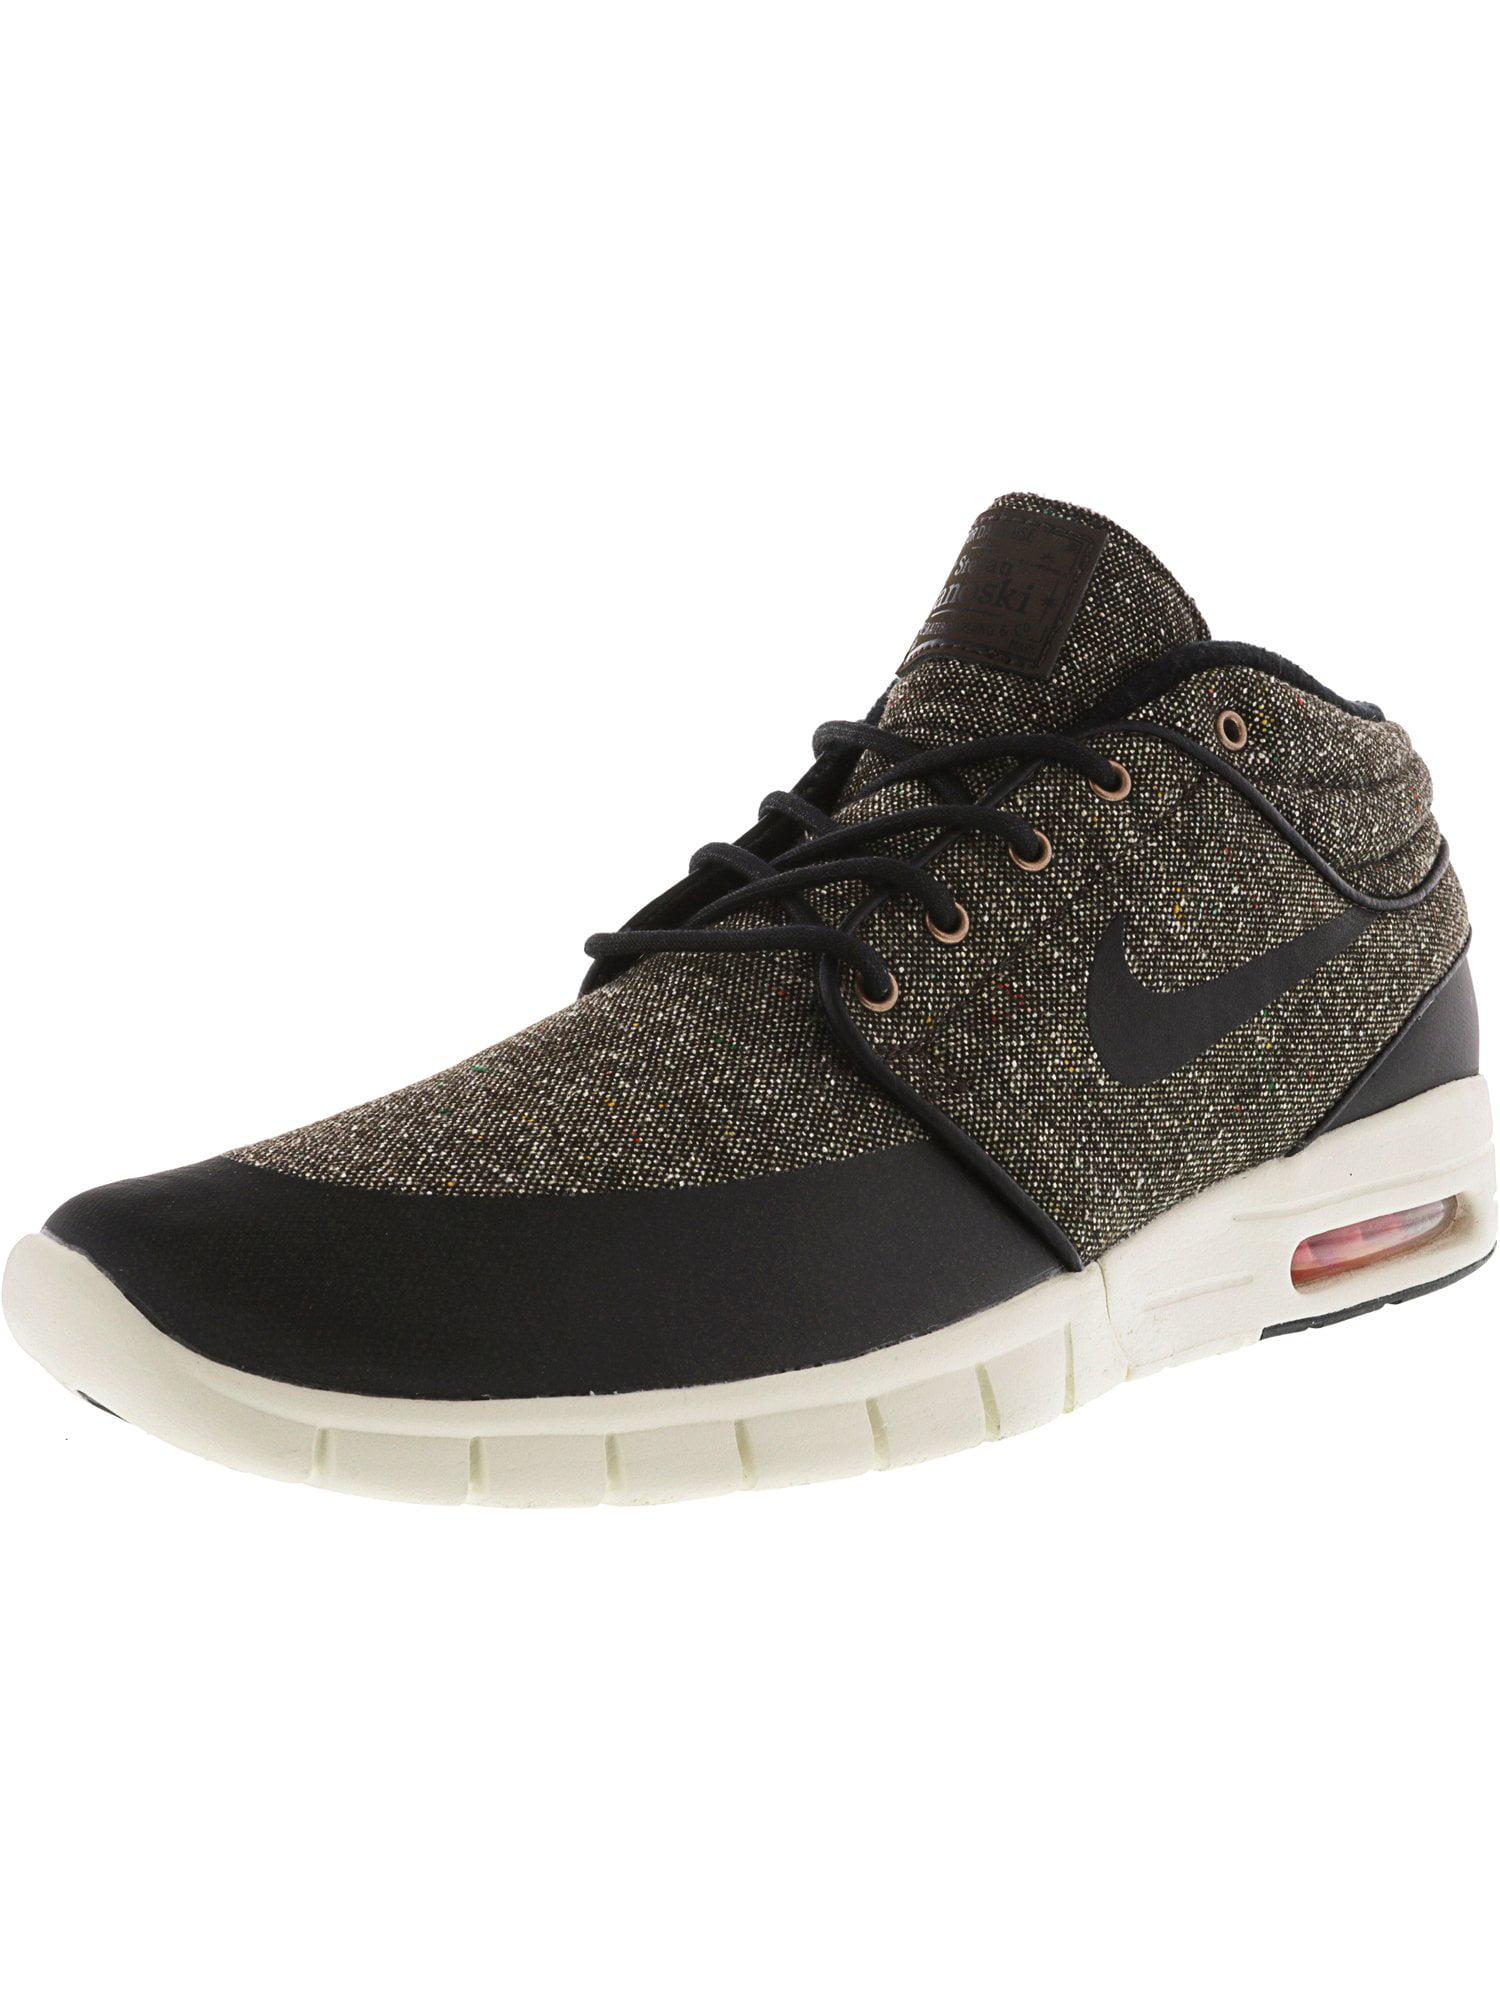 quality design 41028 5e203 ... netherlands nike stefan janoski max mens sneakers d32c0 6da31